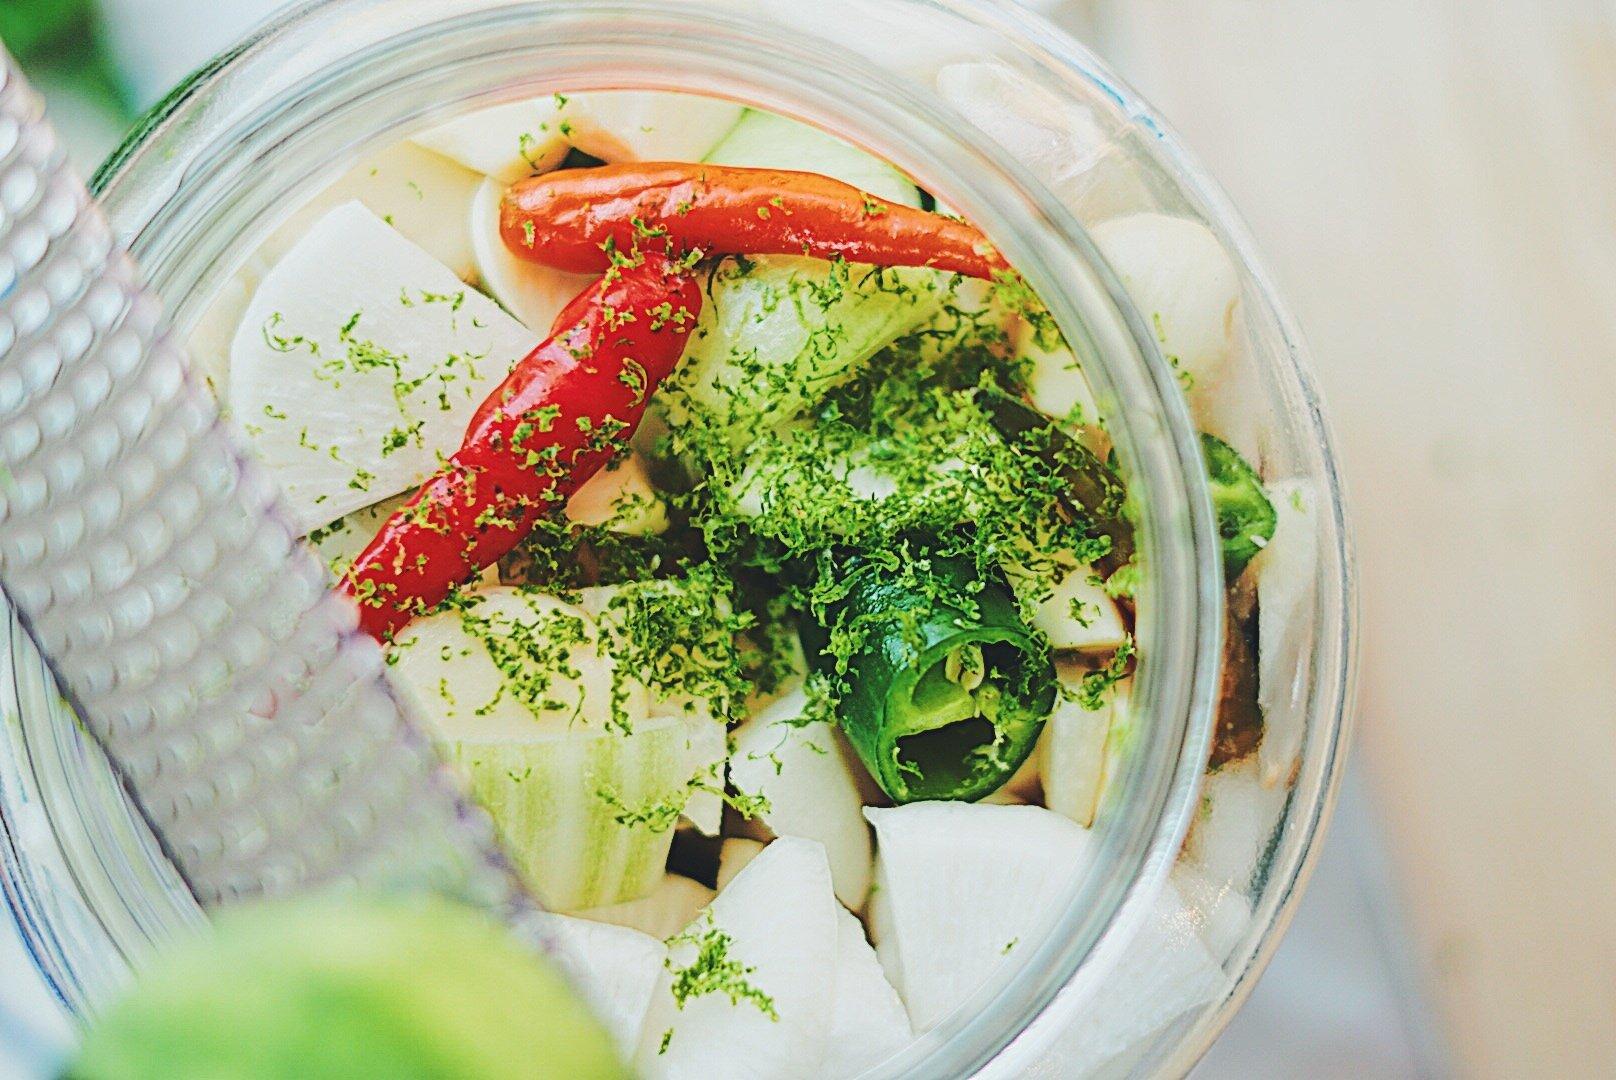 pickle veggies